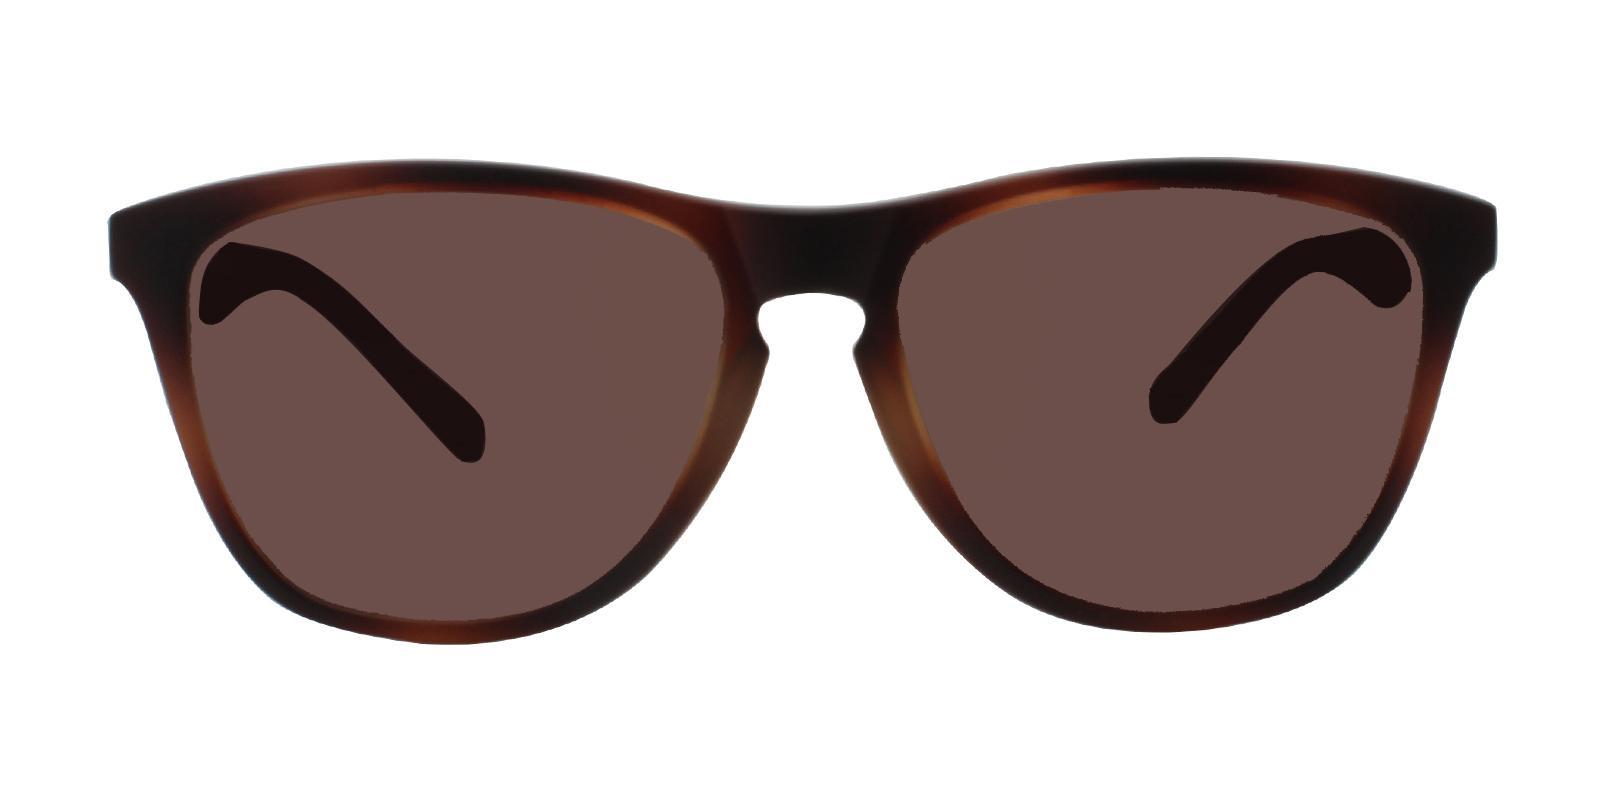 Bentleyville Brown TR Sunglasses , UniversalBridgeFit Frames from ABBE Glasses